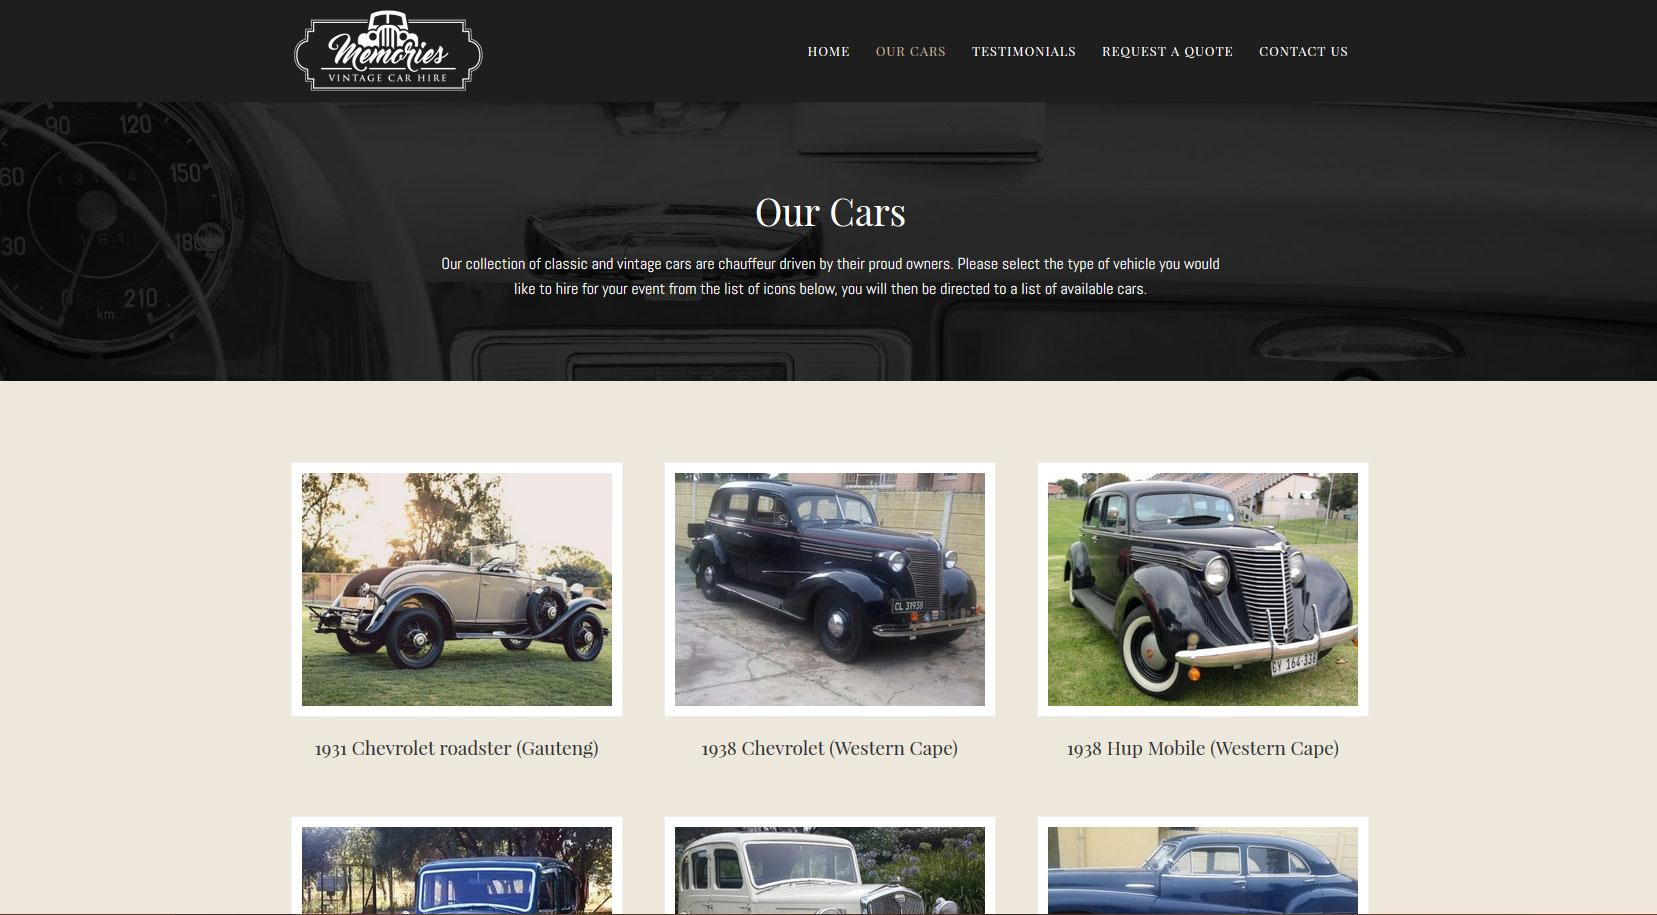 Memories Vintage Car Hire | PixelBrick Digital Design